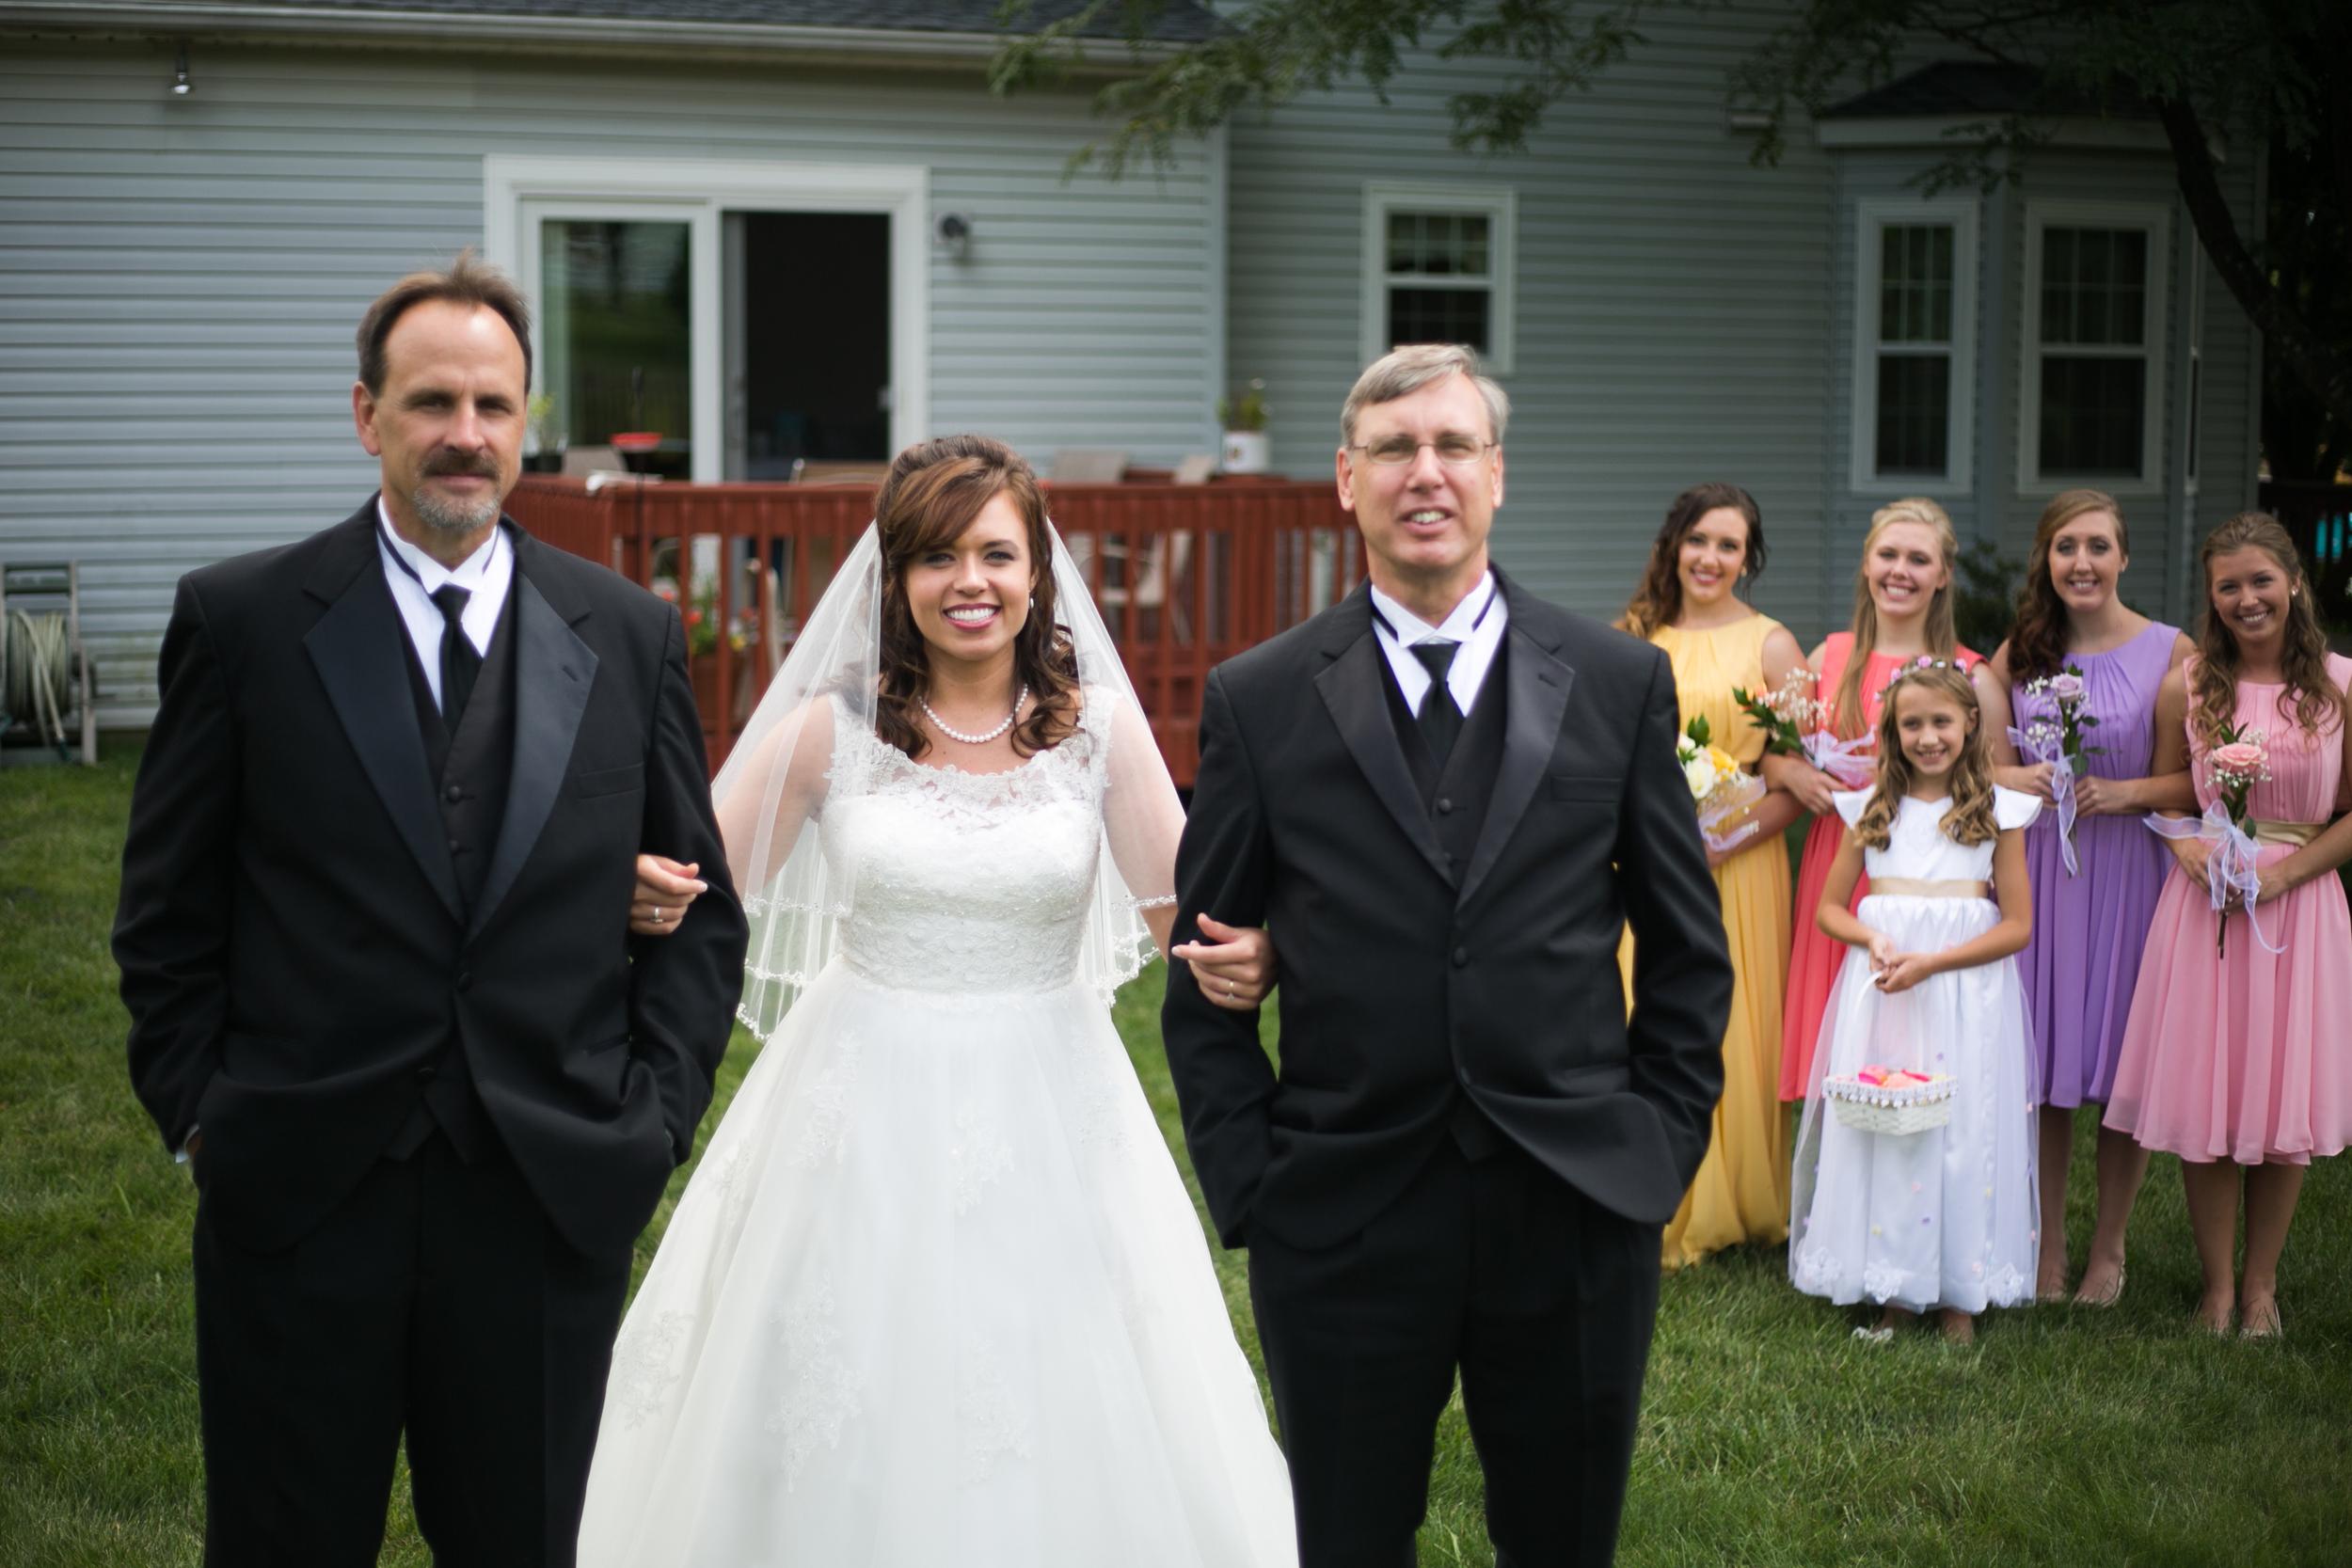 mary-brad-sizemore-wedding-naylor-vineyard-living-radiant-photography-2014-152.jpg